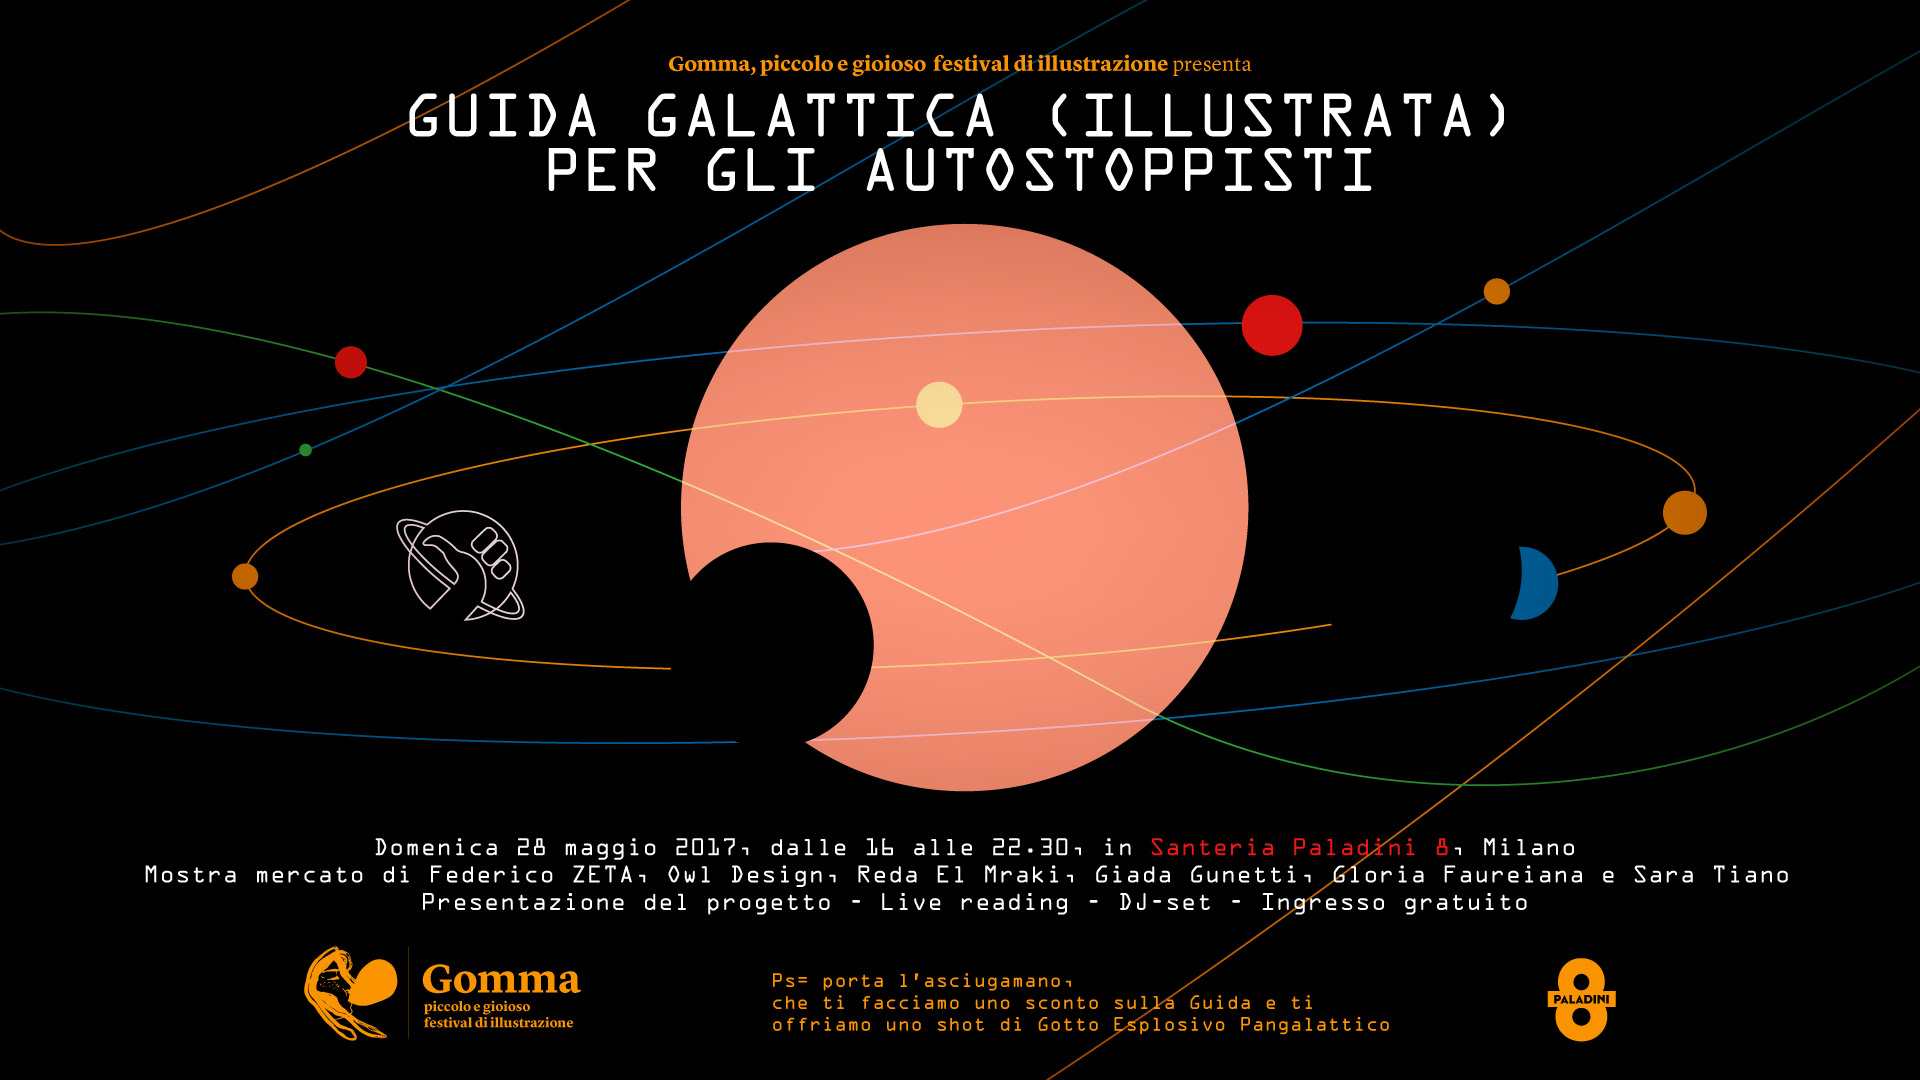 guida-galattica-gomma-festival